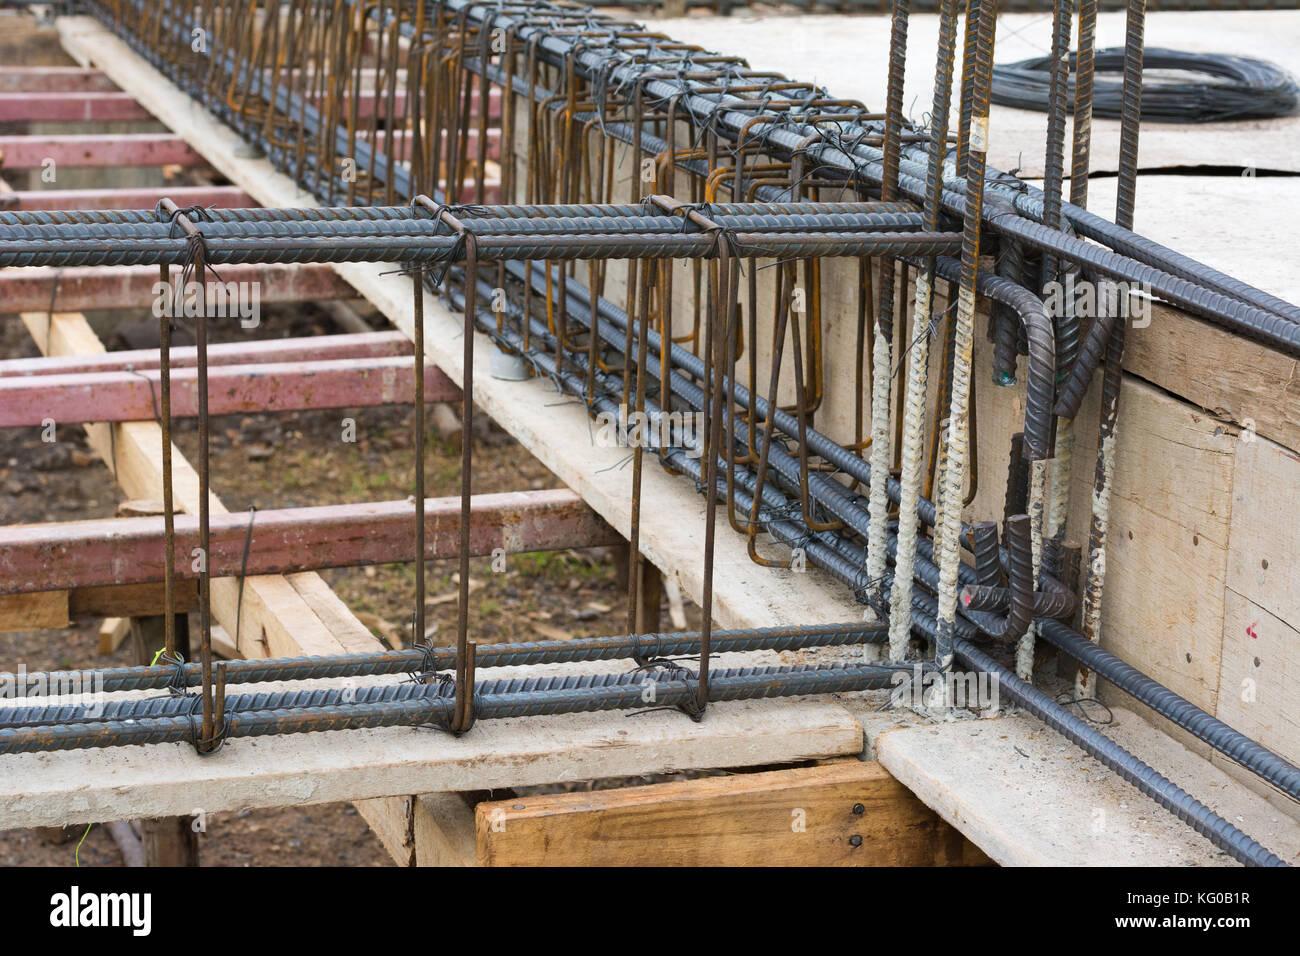 Steel Reinforcement Bars : Concrete reinforcing bar stock photos